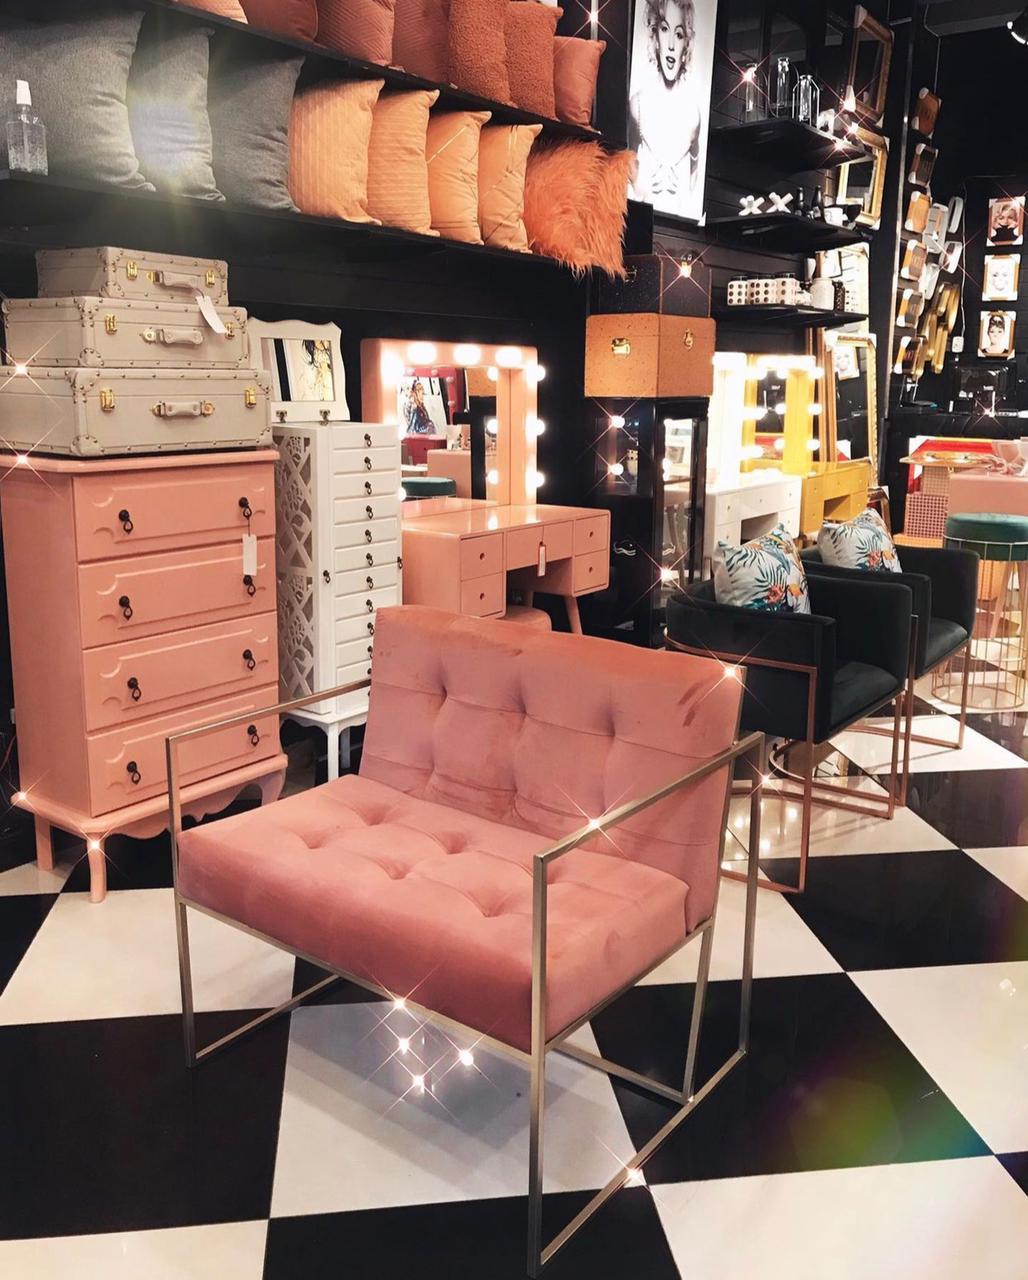 Poltrona Urban Confort- Rosa Queimado